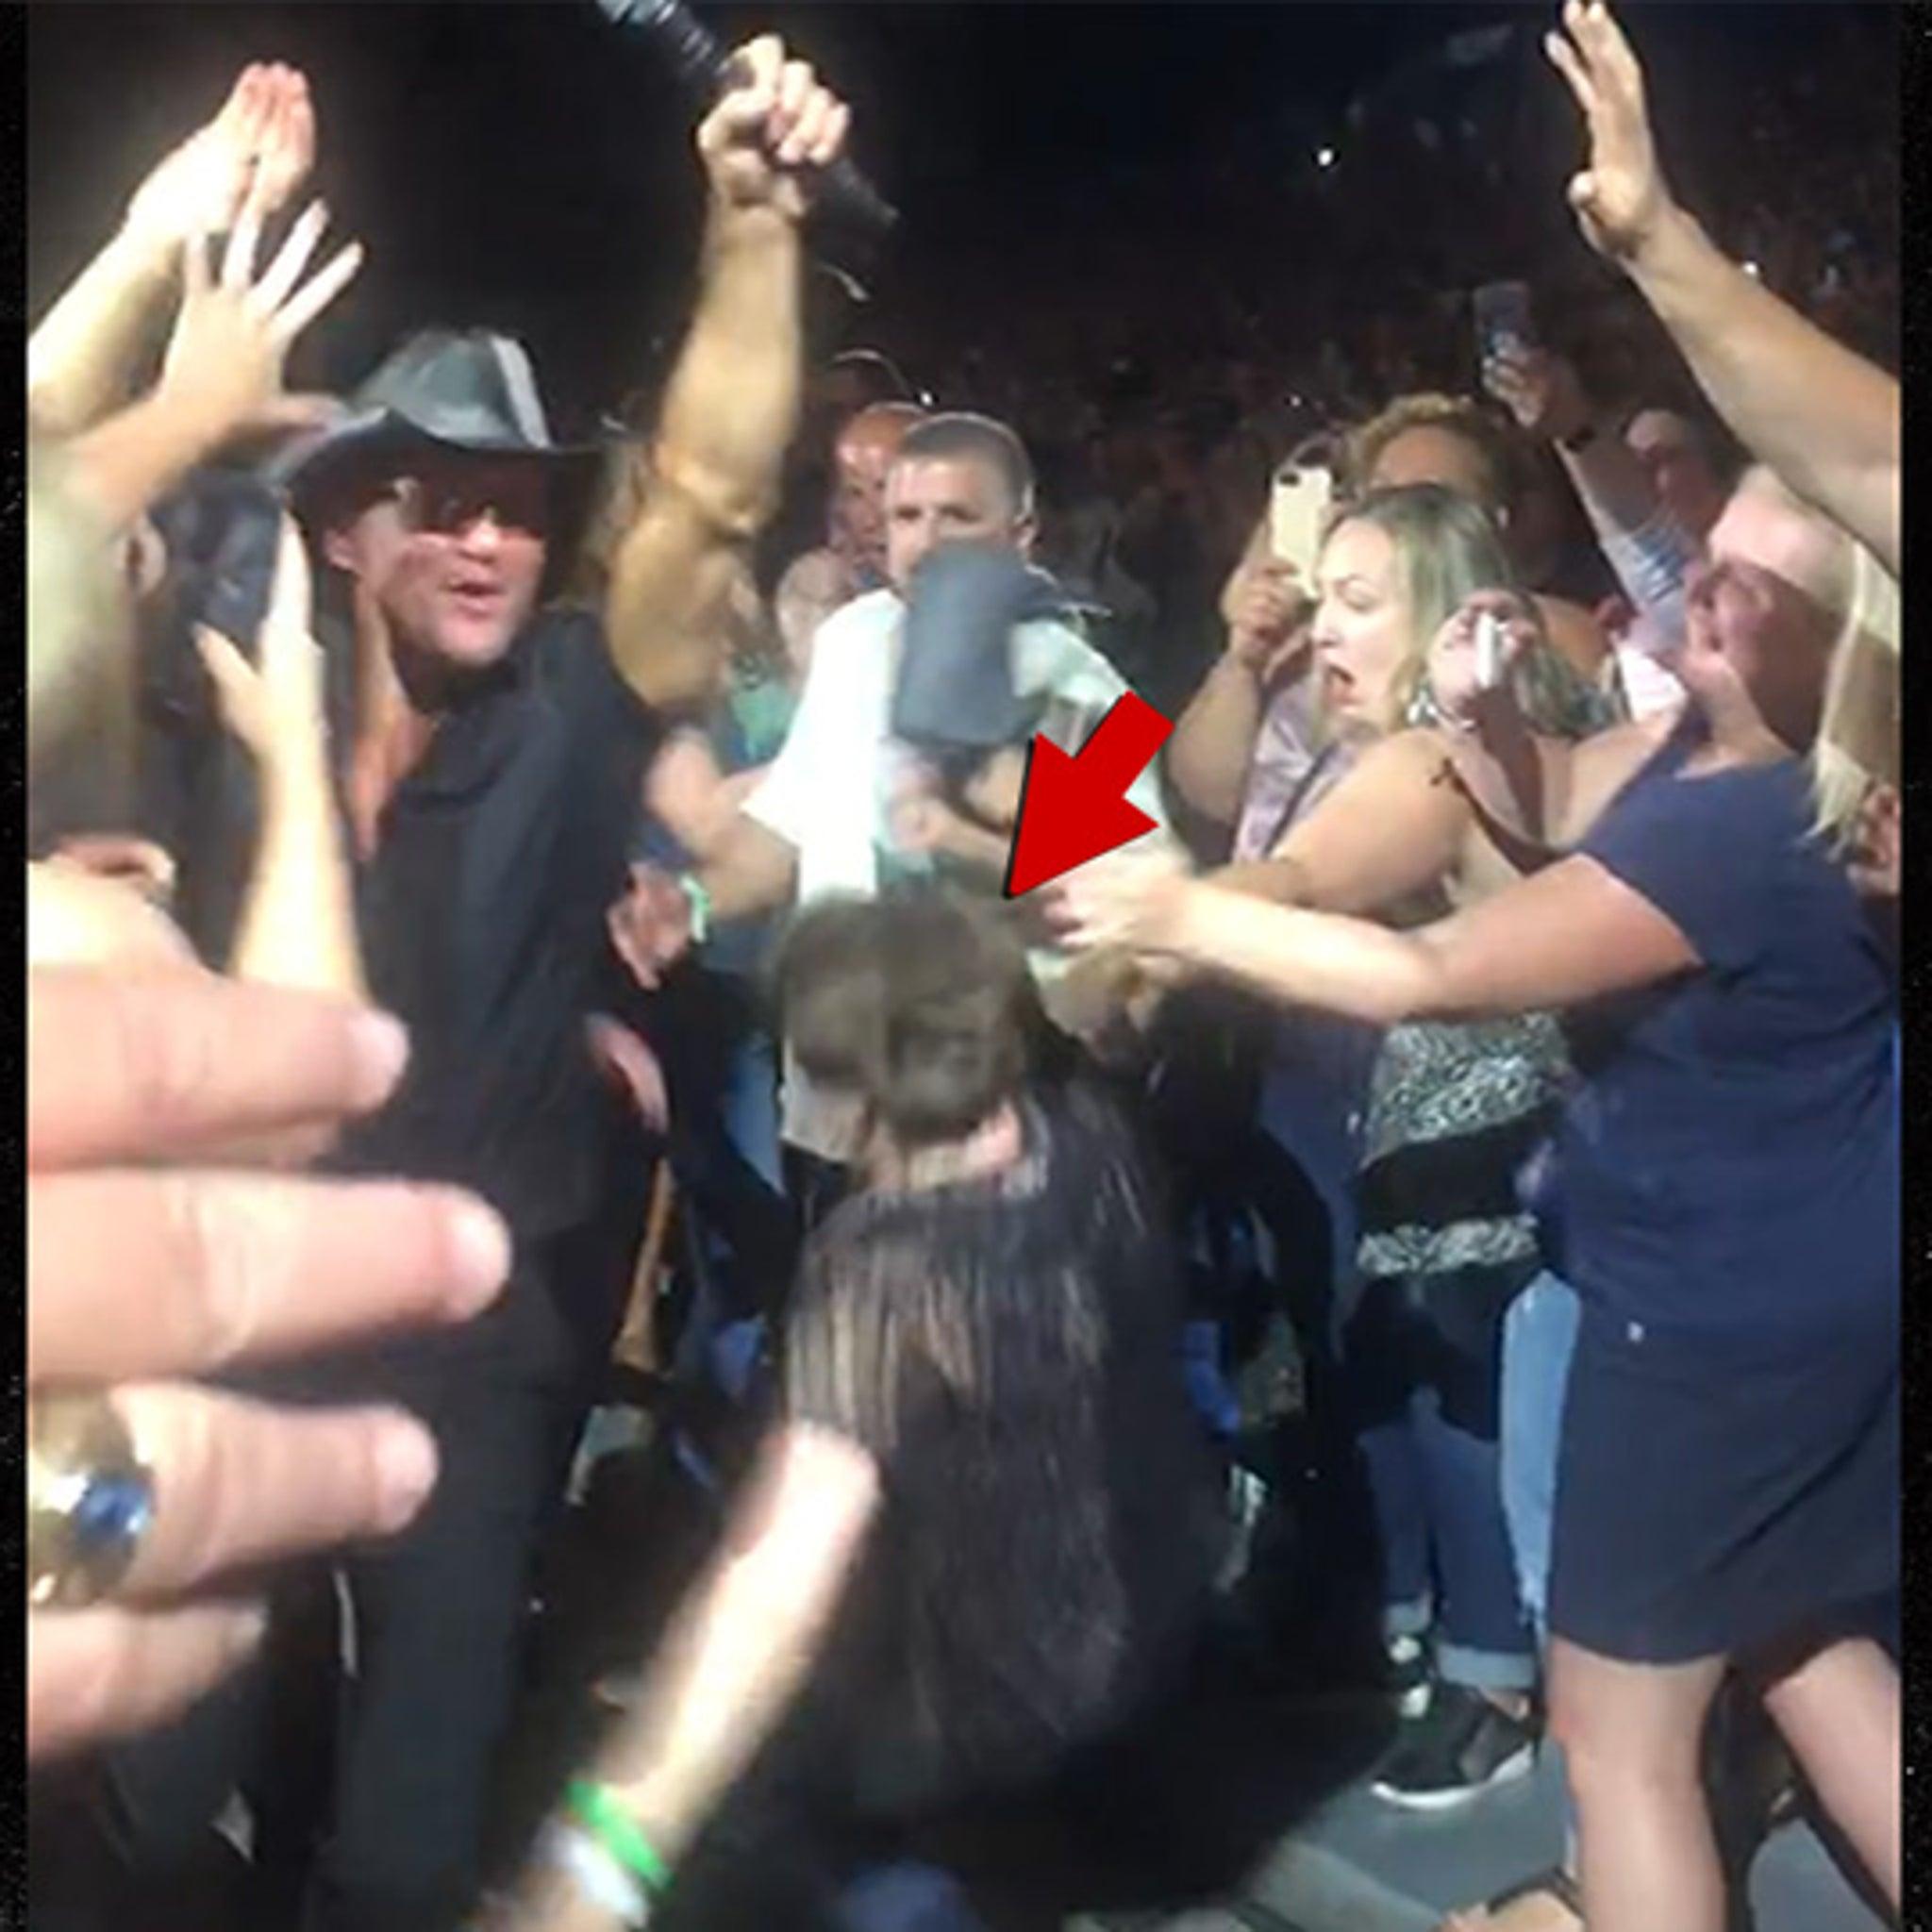 Tim McGraw Concert, Female Fan Falls Hard (VIDEO)